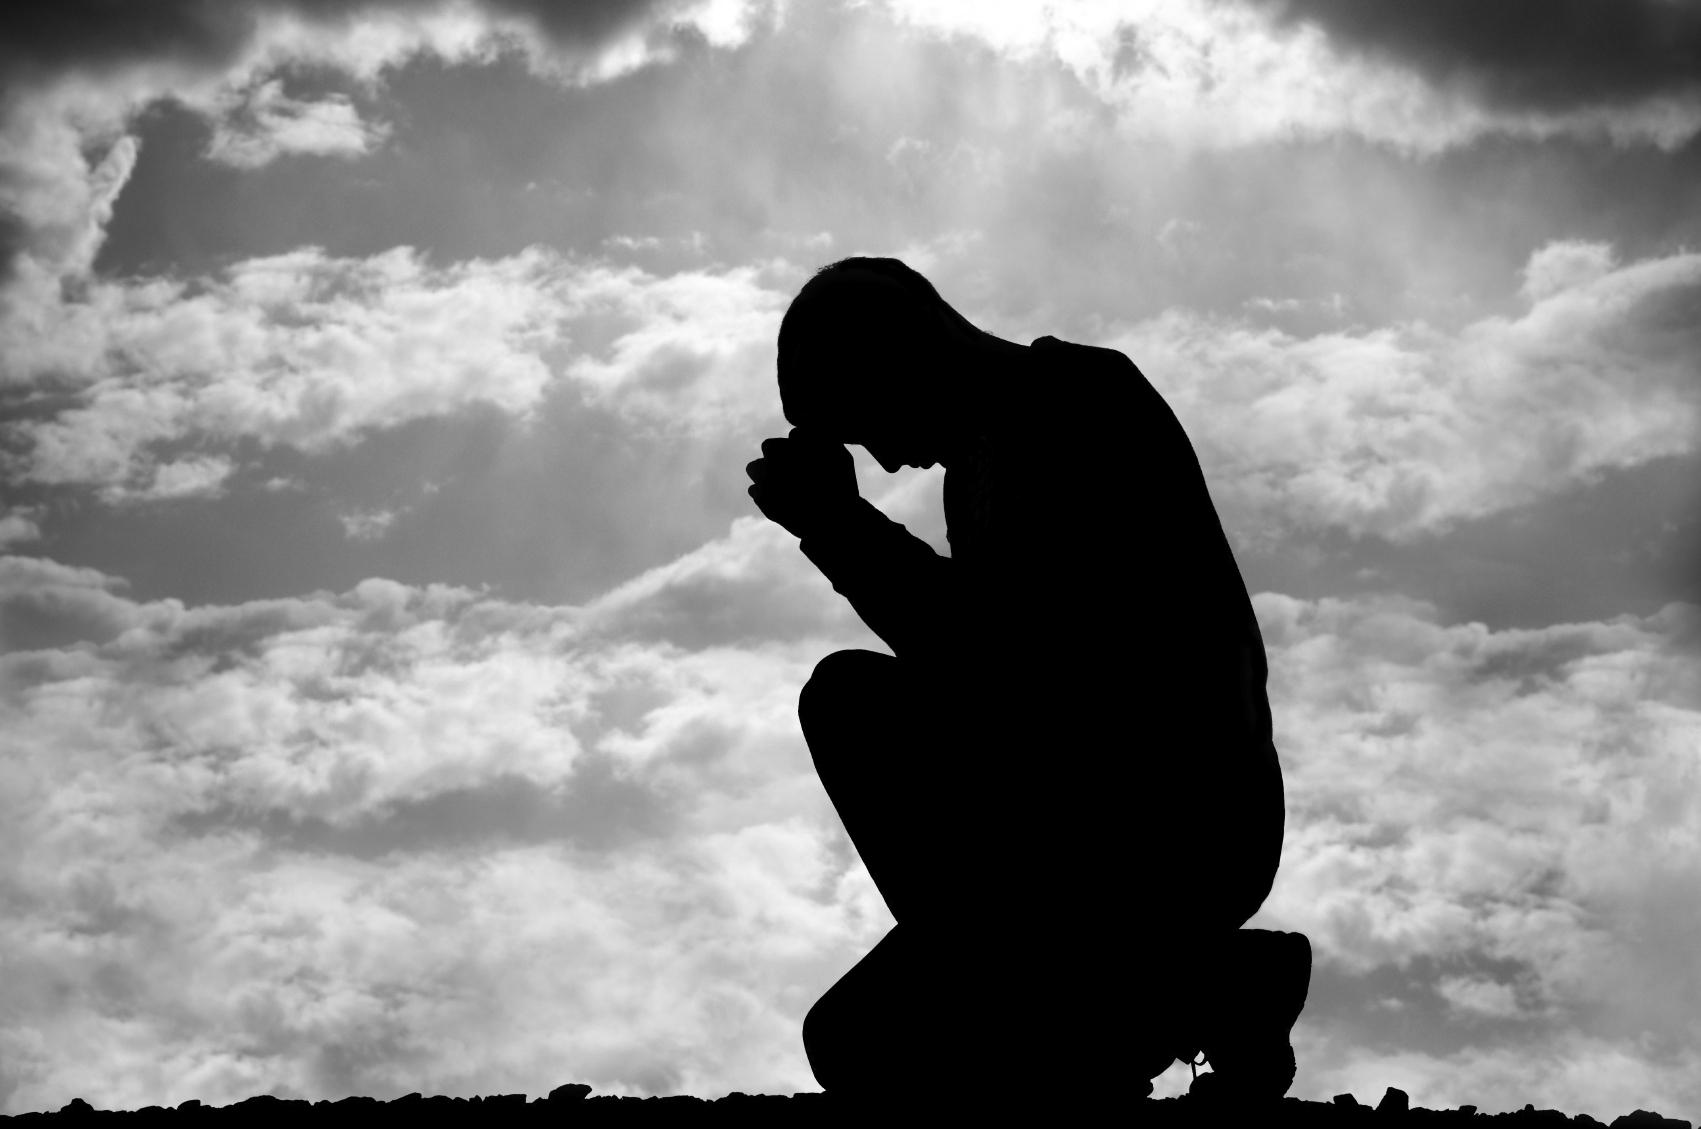 humility-silhouette-kneeling-man-praying-man-prayer-the-trent